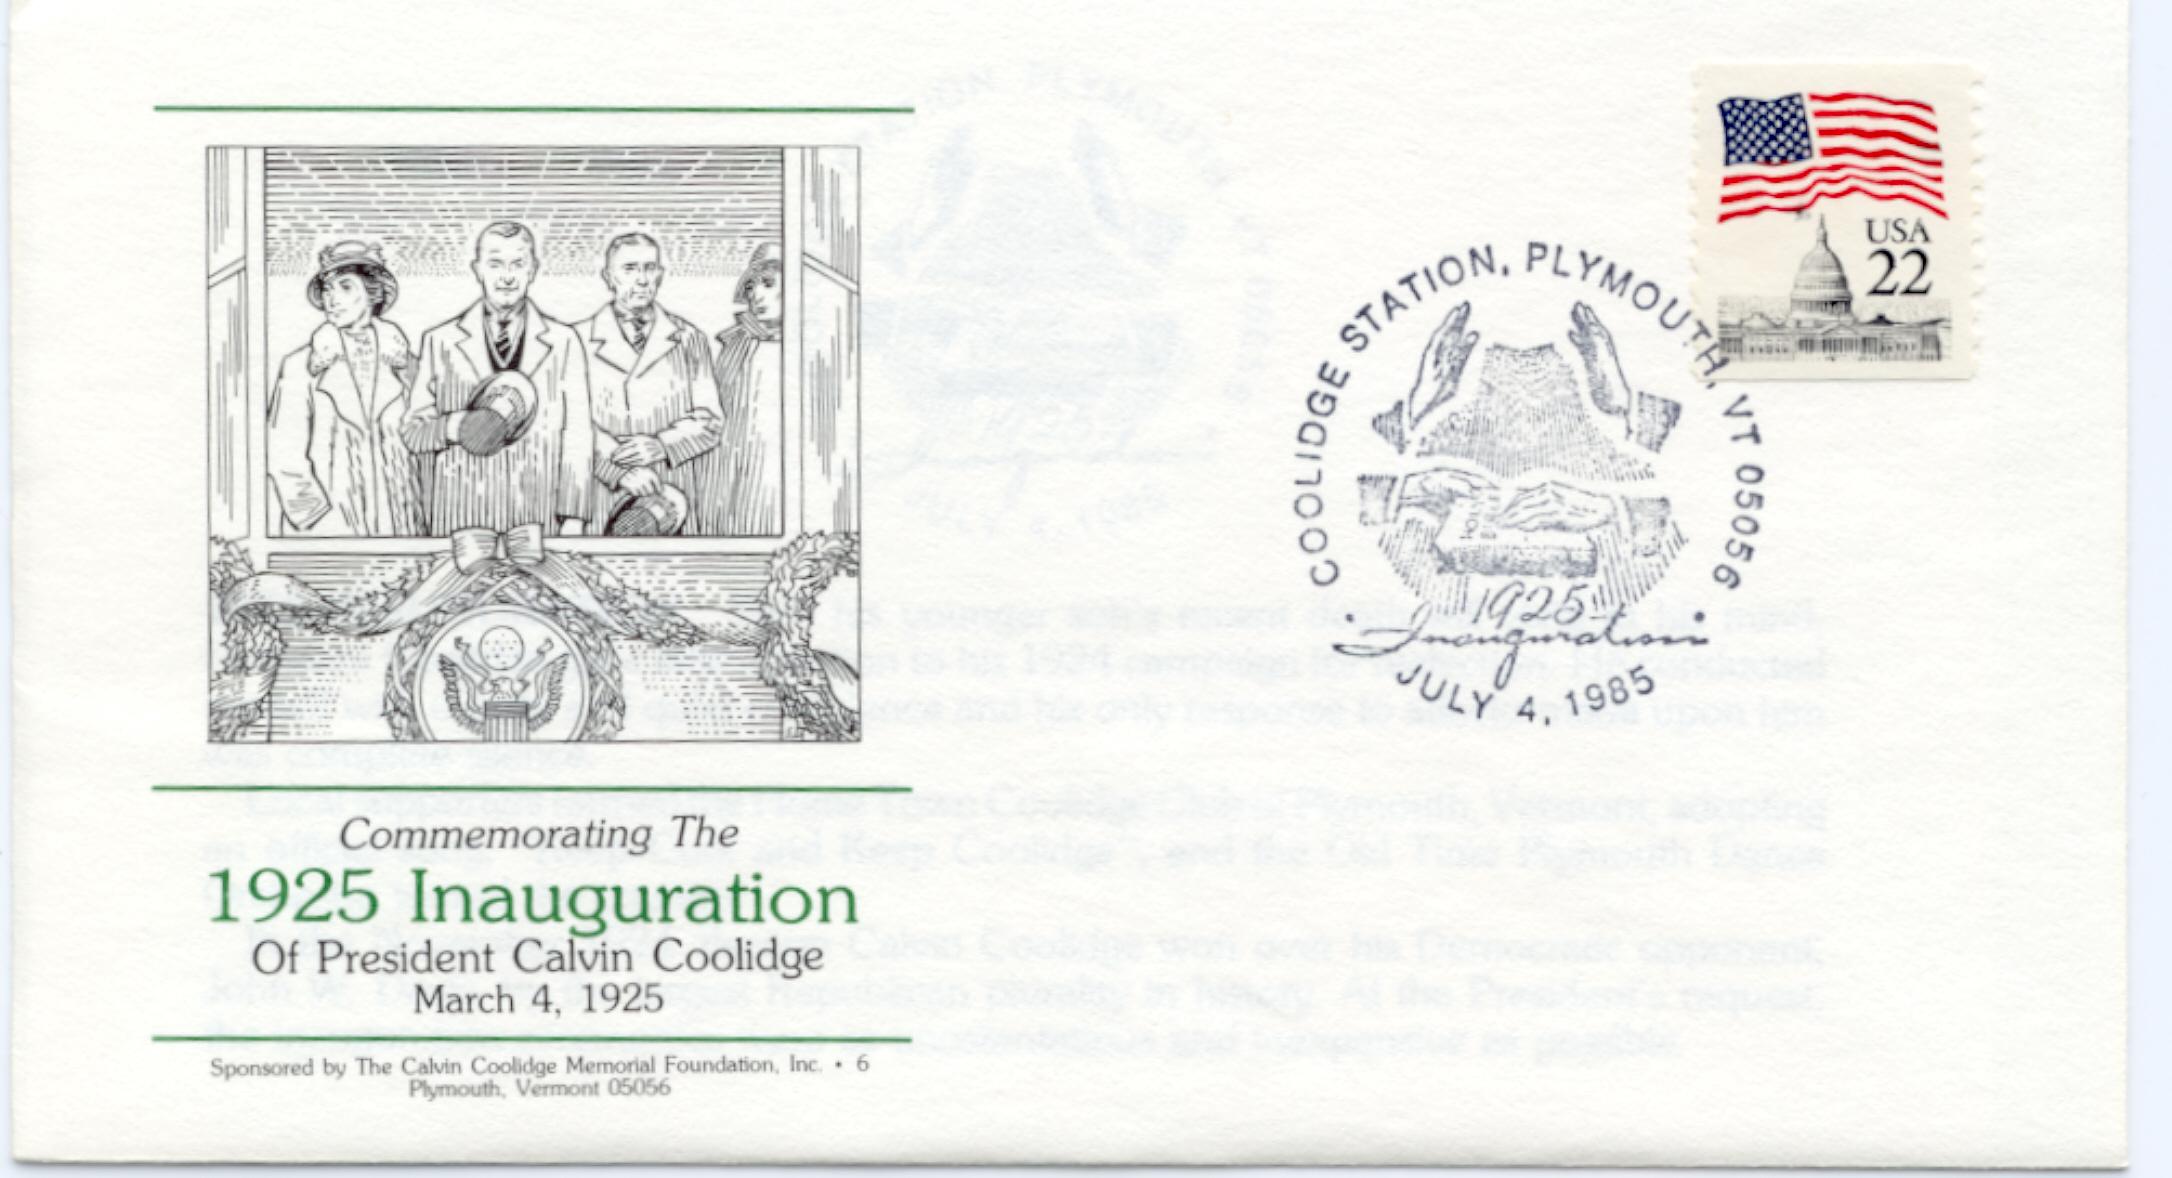 1925 Inauguration 85-07-04